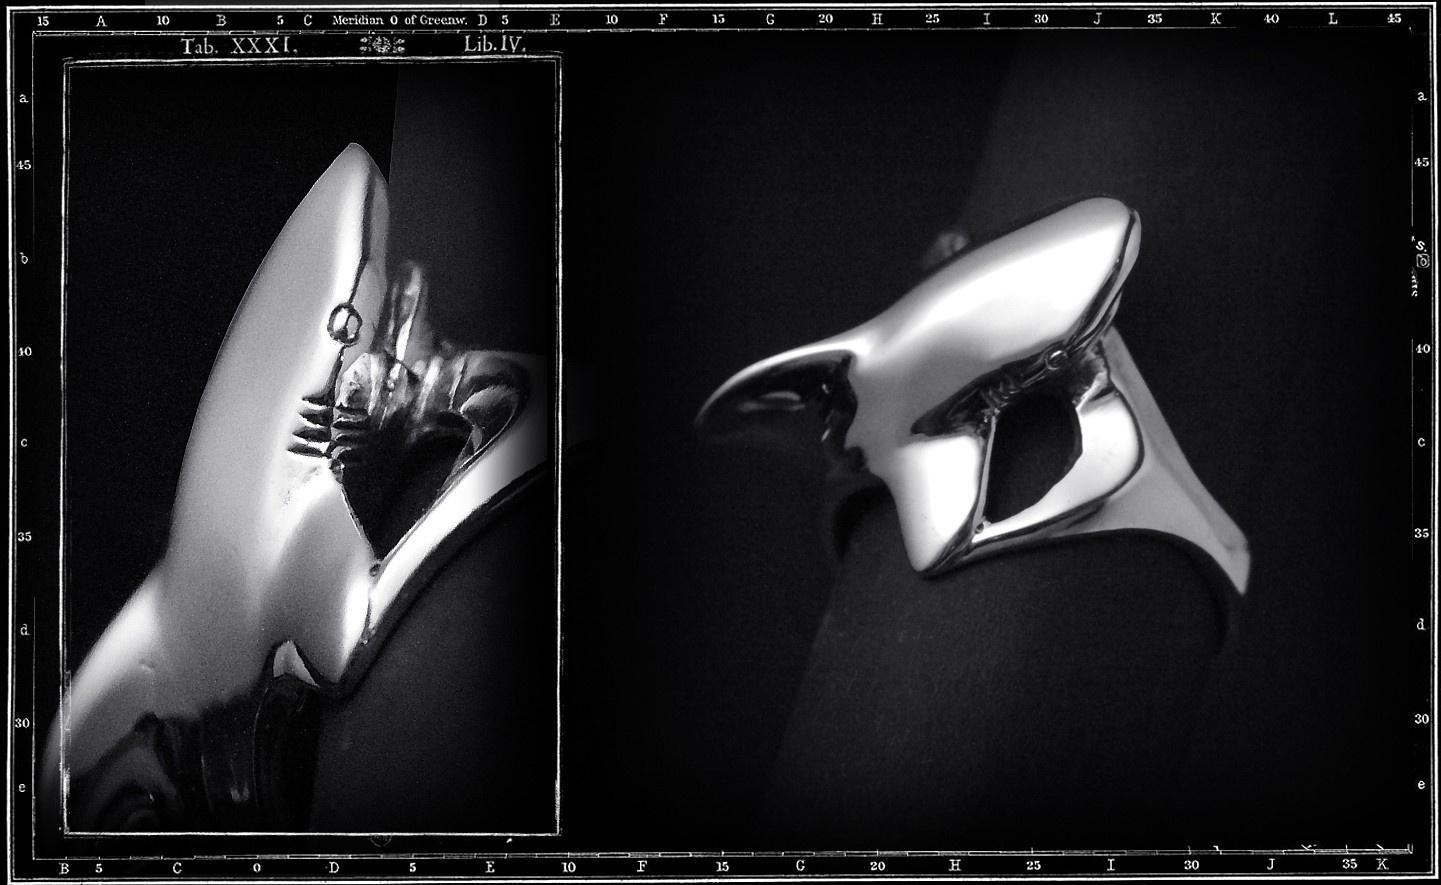 SHARK (WHOLEBODY) RING